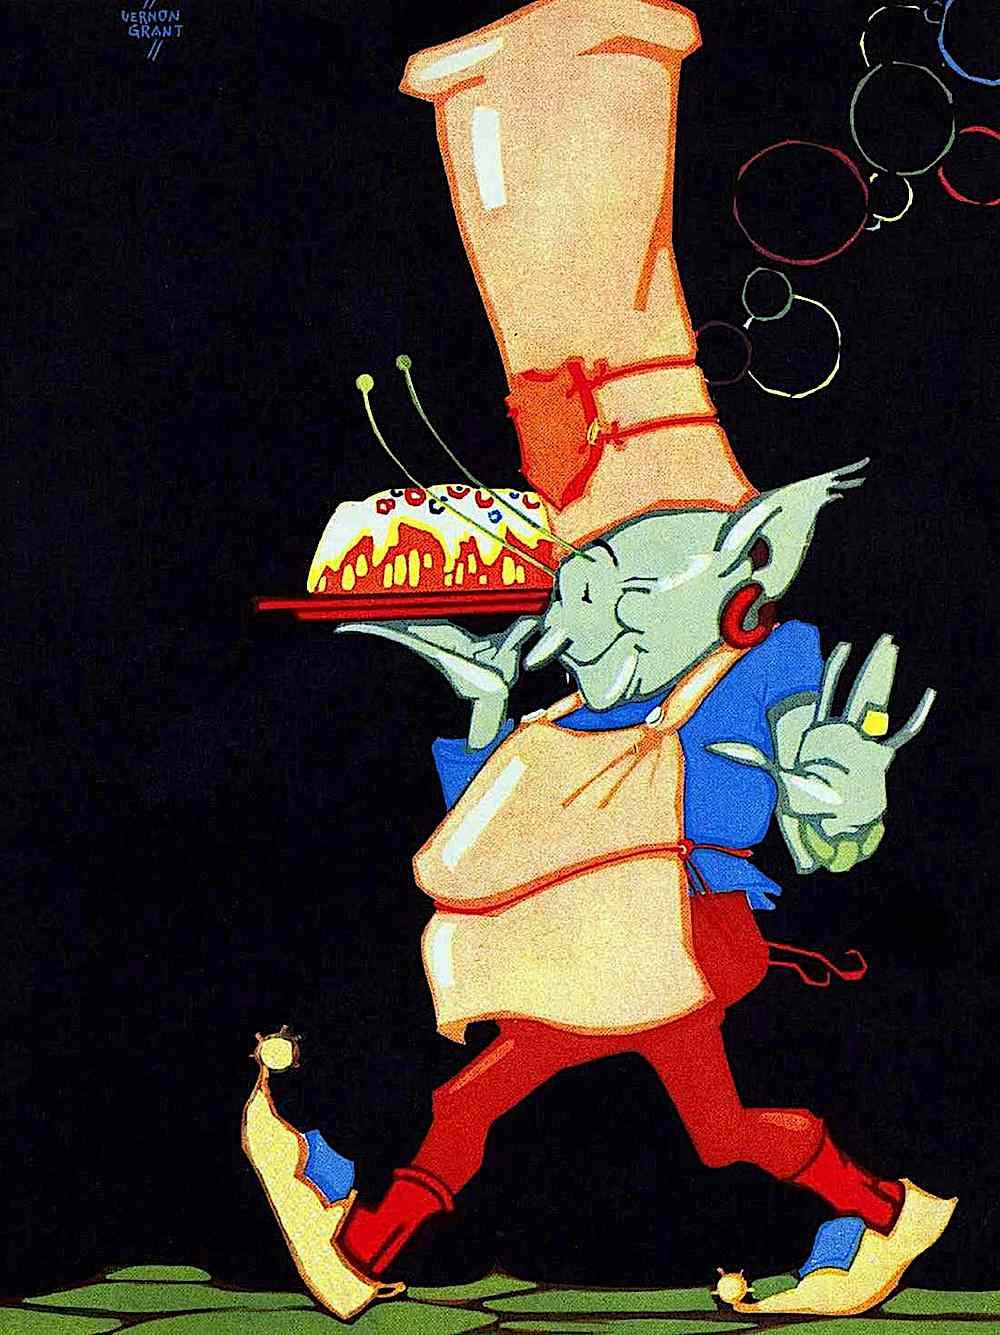 a Vernon Grant children's book illustration of pixie chefs